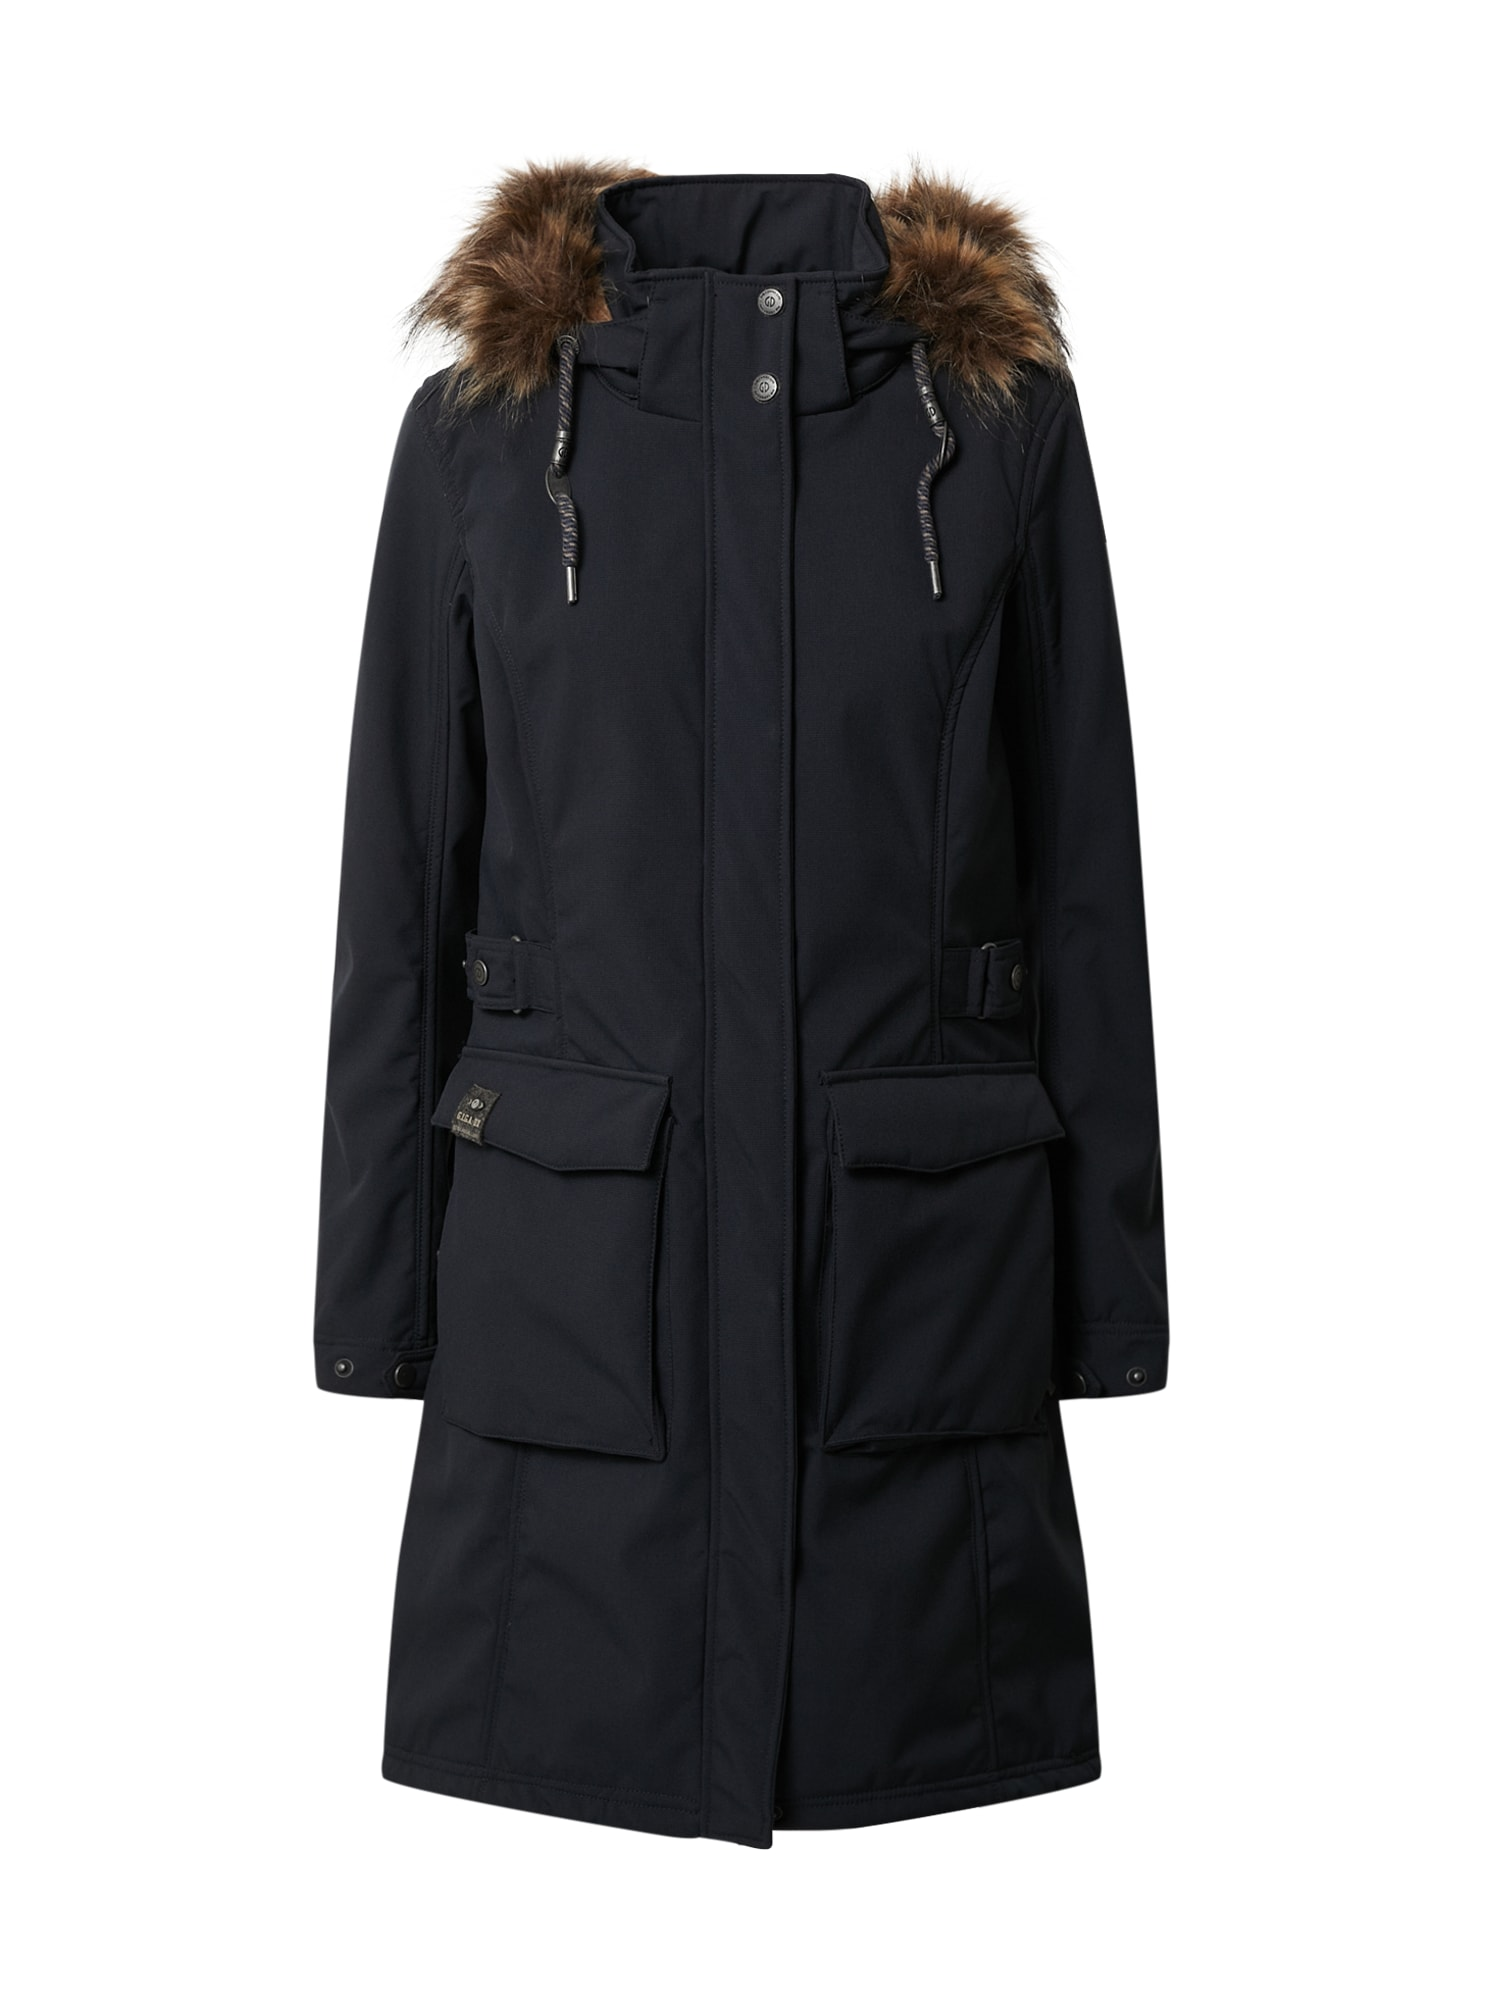 G.I.G.A. DX by killtec Laisvalaikio paltas